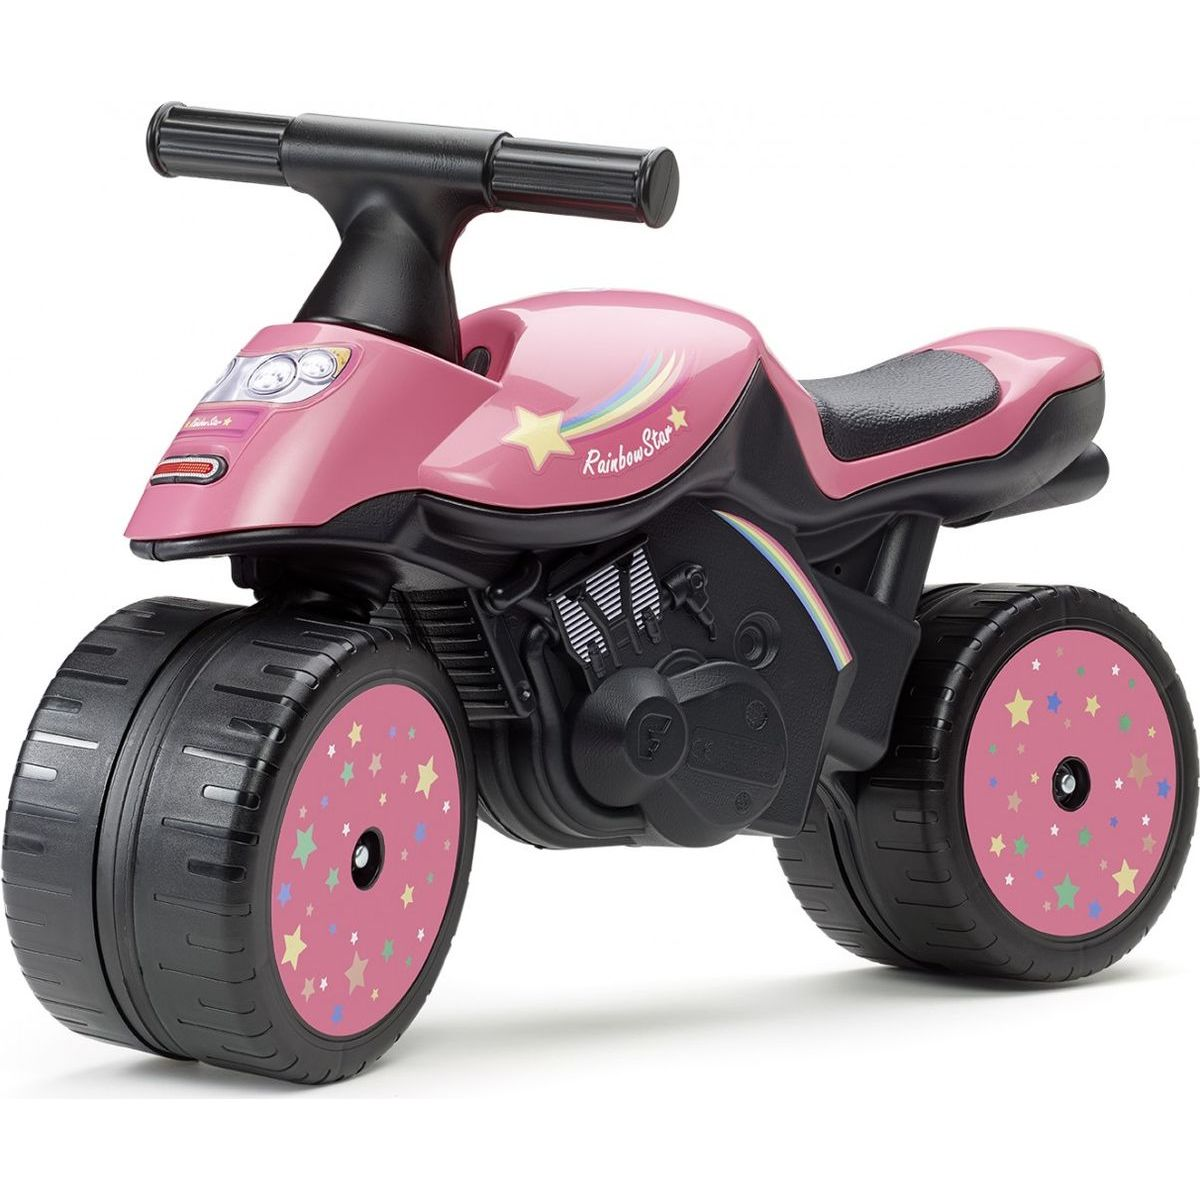 Falk Odstrkovadlo motorka ružová Rainbow star